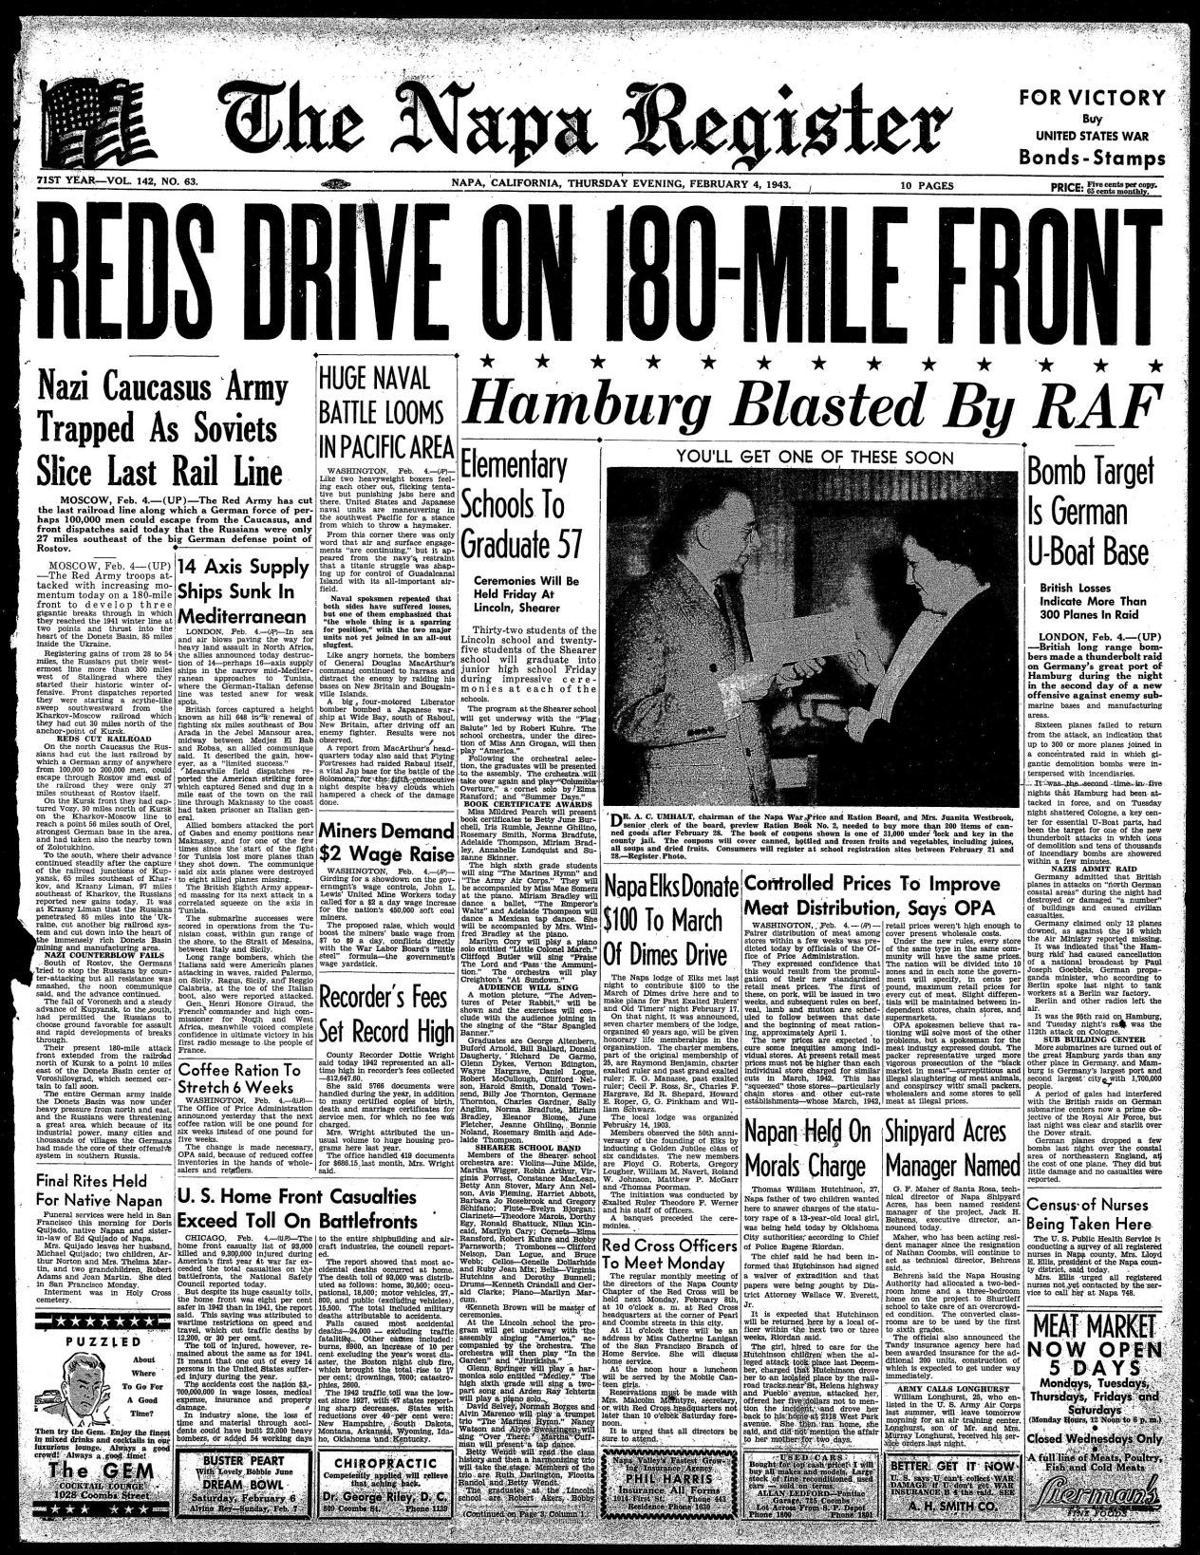 Feb. 4, 1943